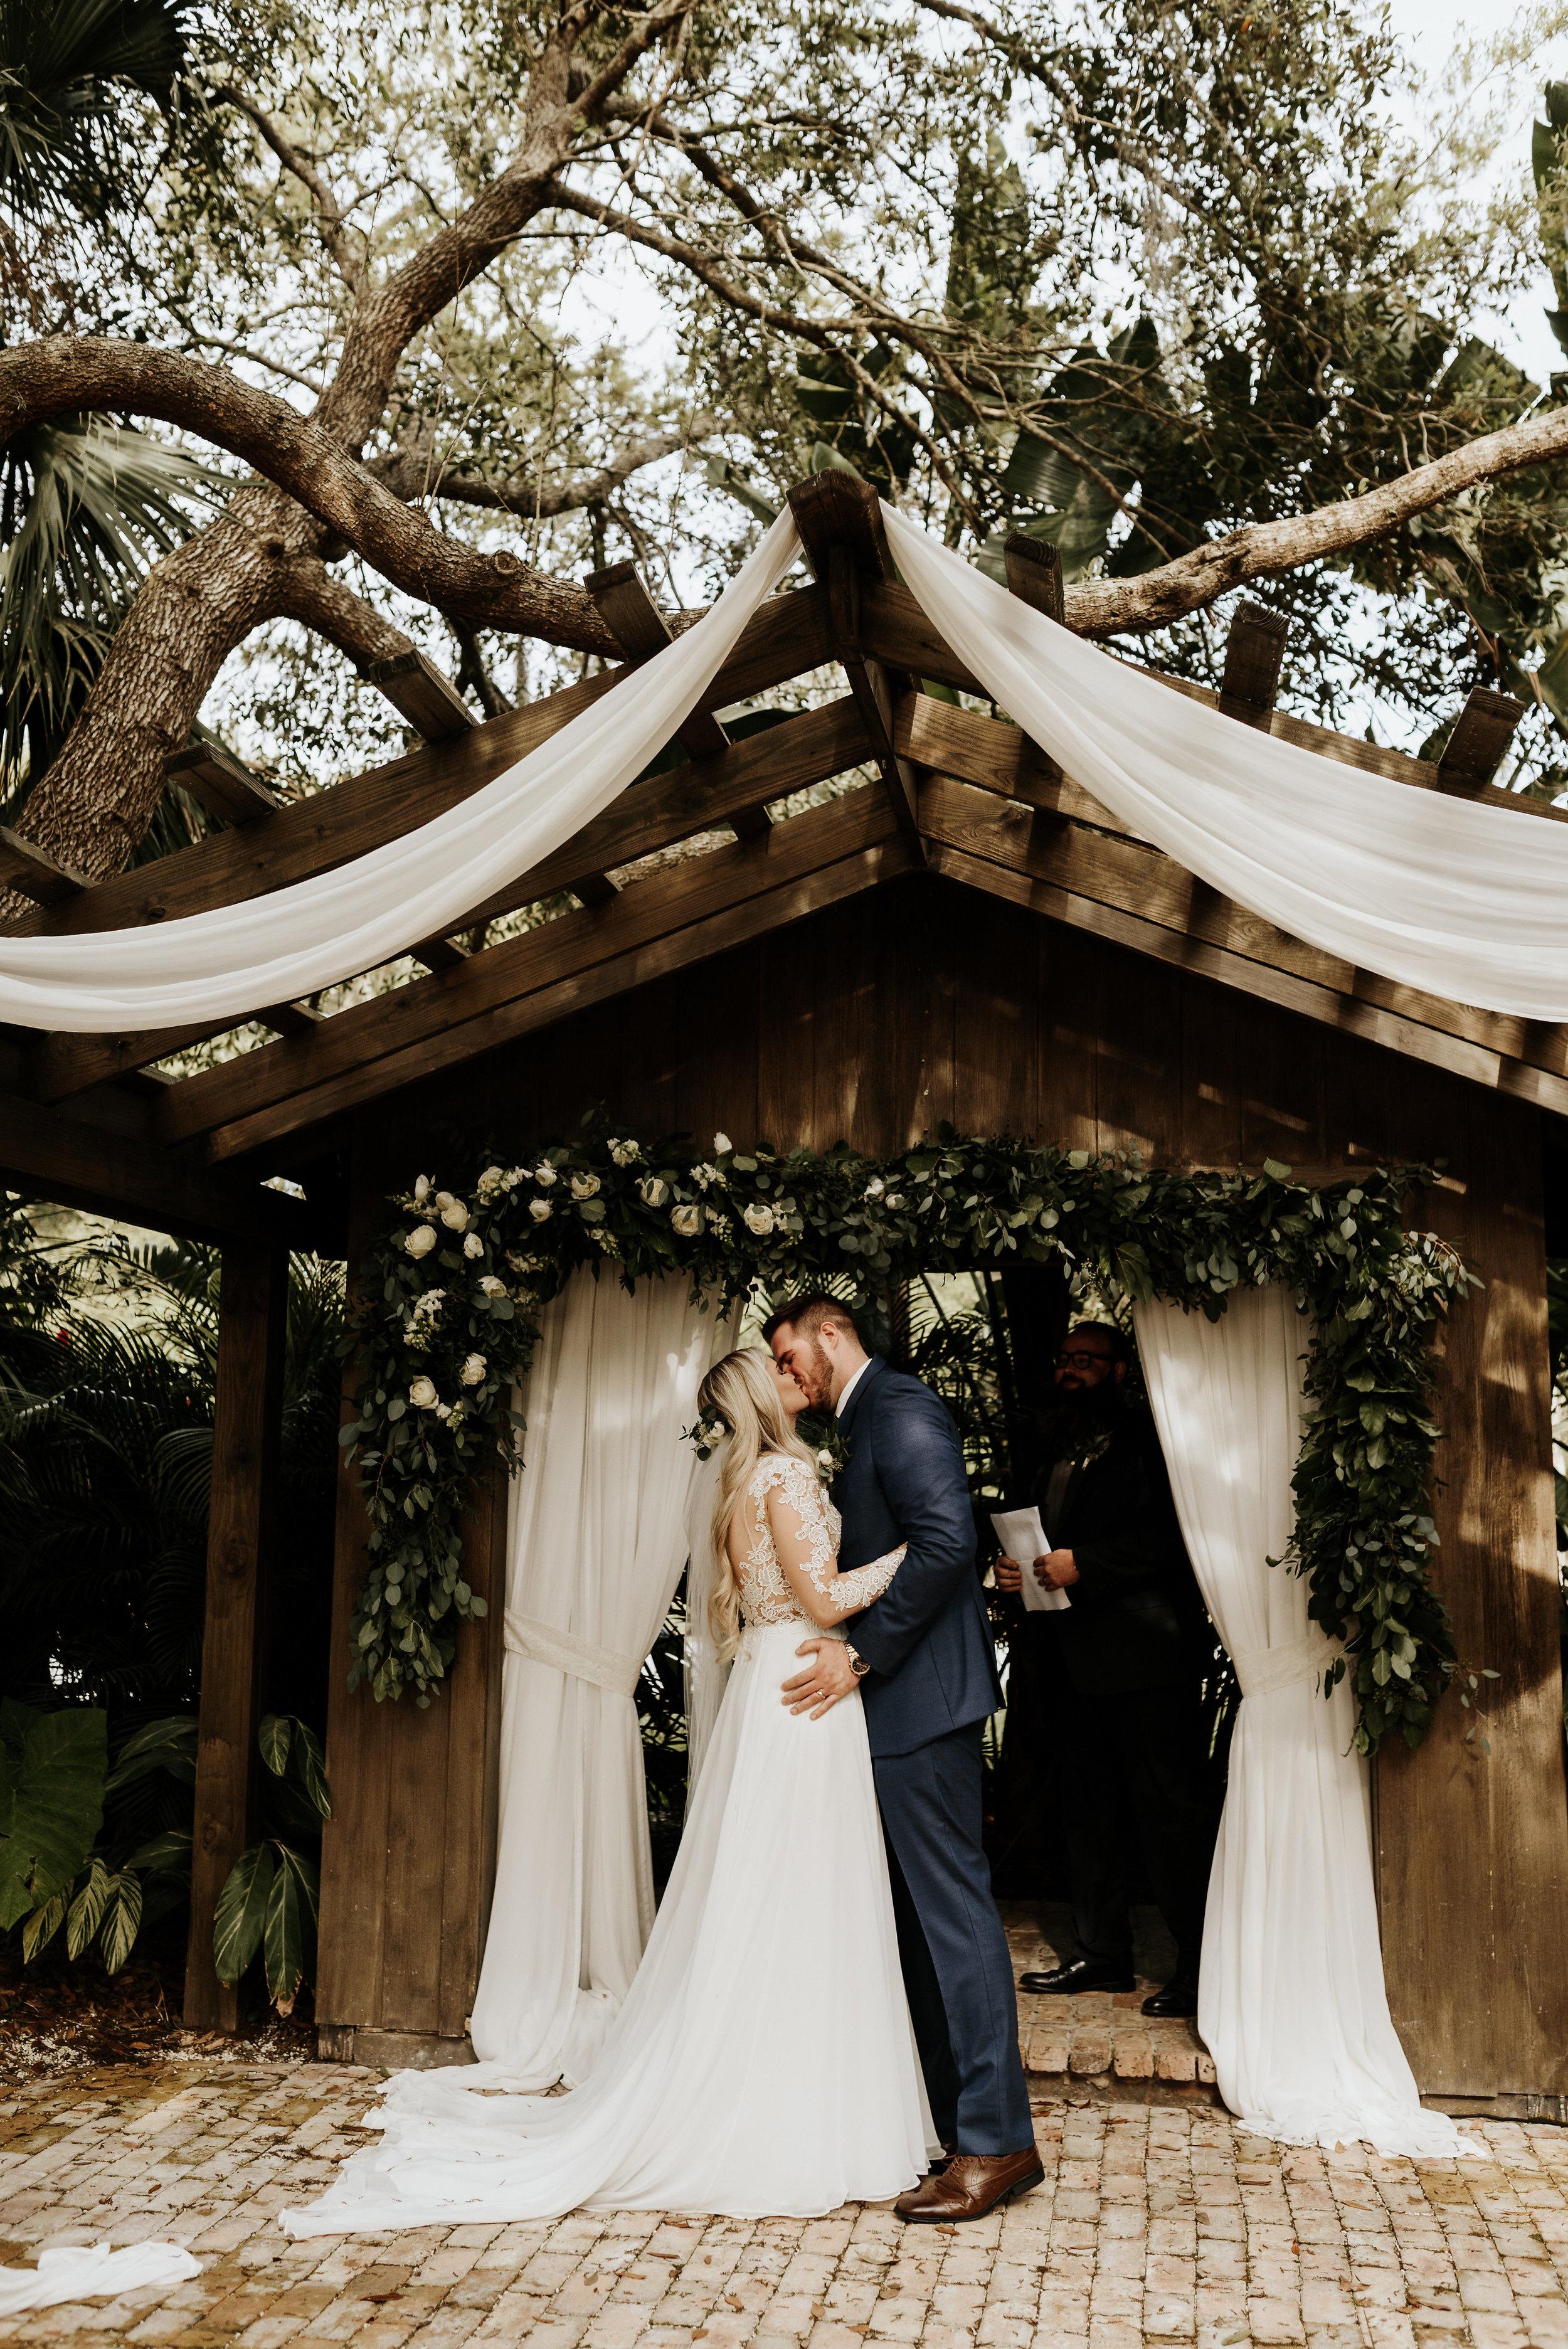 Mikenzi_Brad_Wedding_The_Delamater_House_New_Smyrna_Beach_Florida_Photography_by_V_0220.jpg